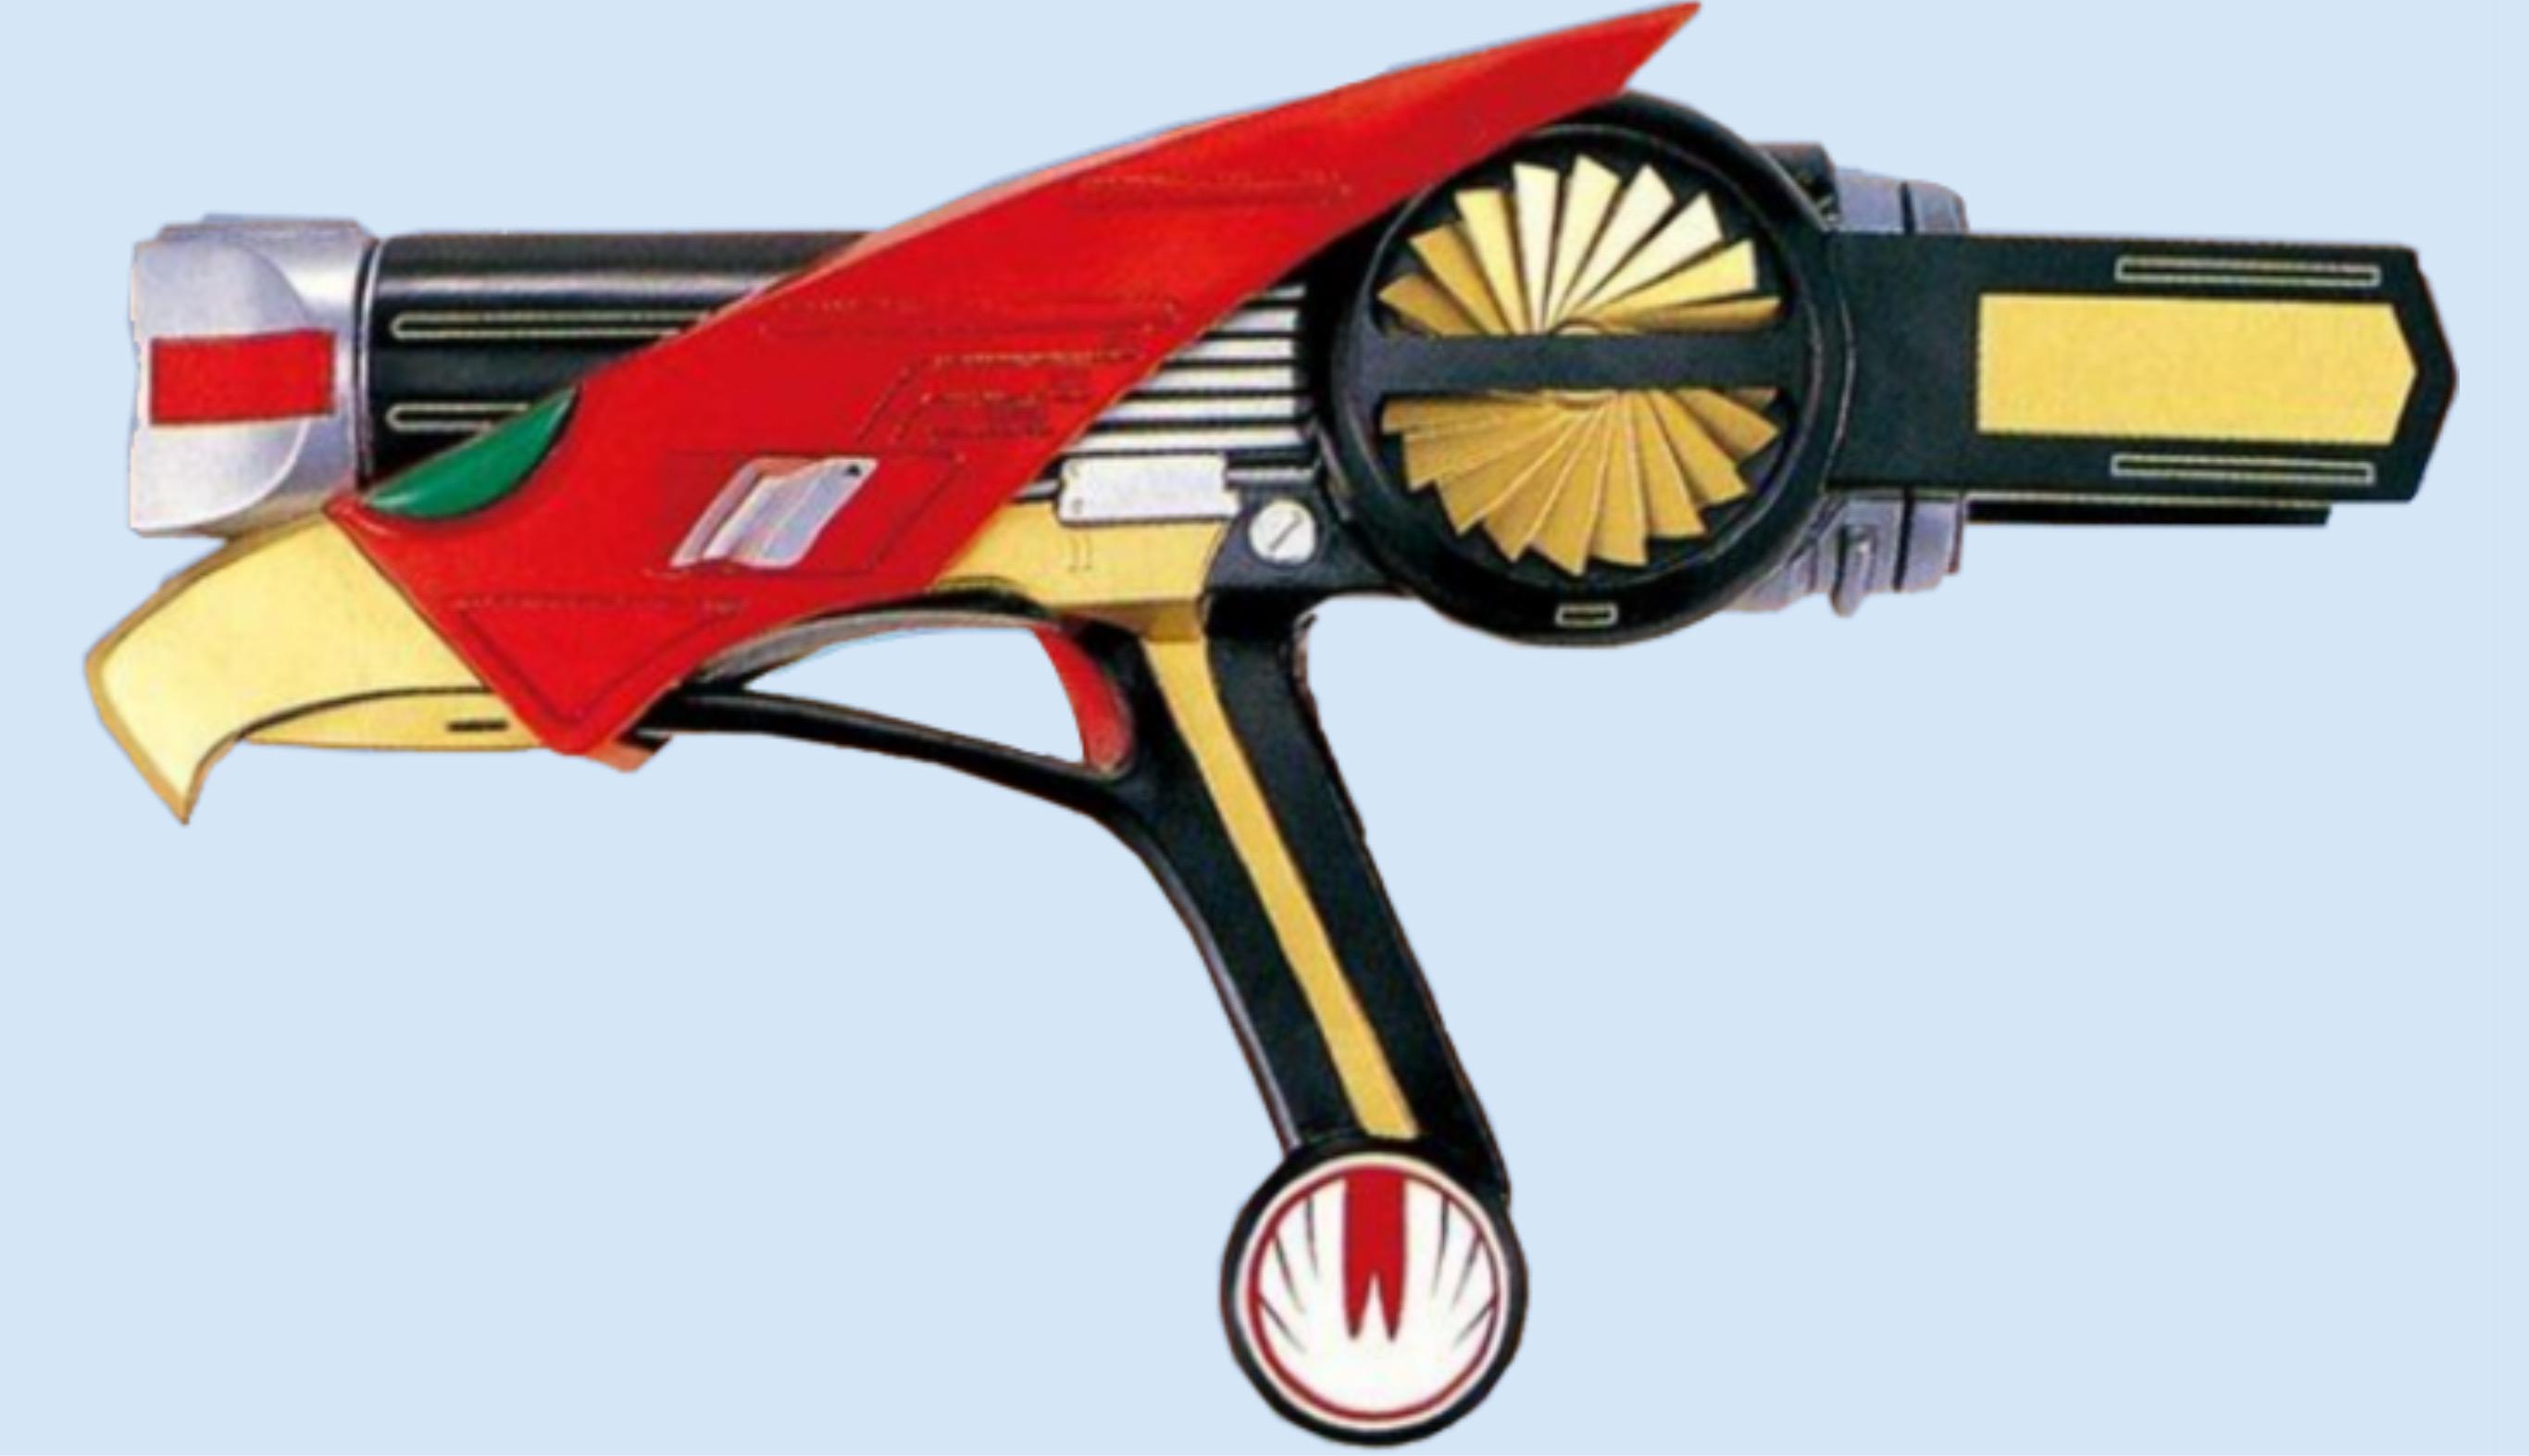 Hawk Blaster